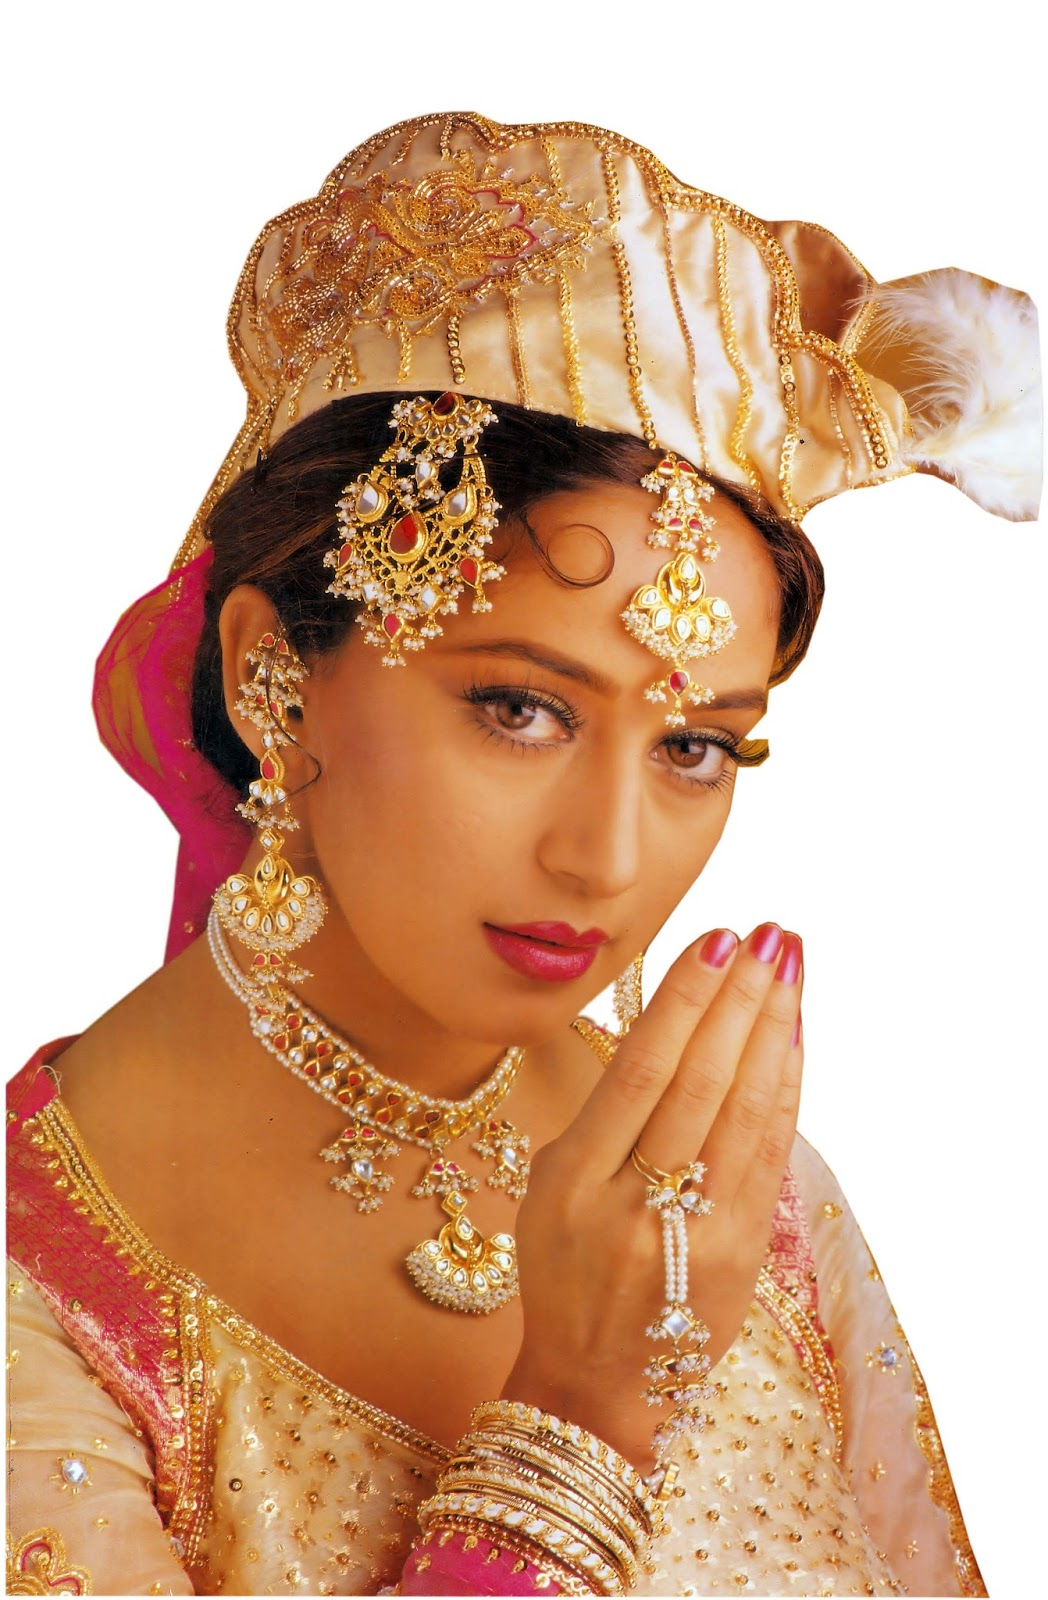 Sinhala Wal Katha Aluth Site Eka Realwalkatha Blogspot Com Download Lengkap